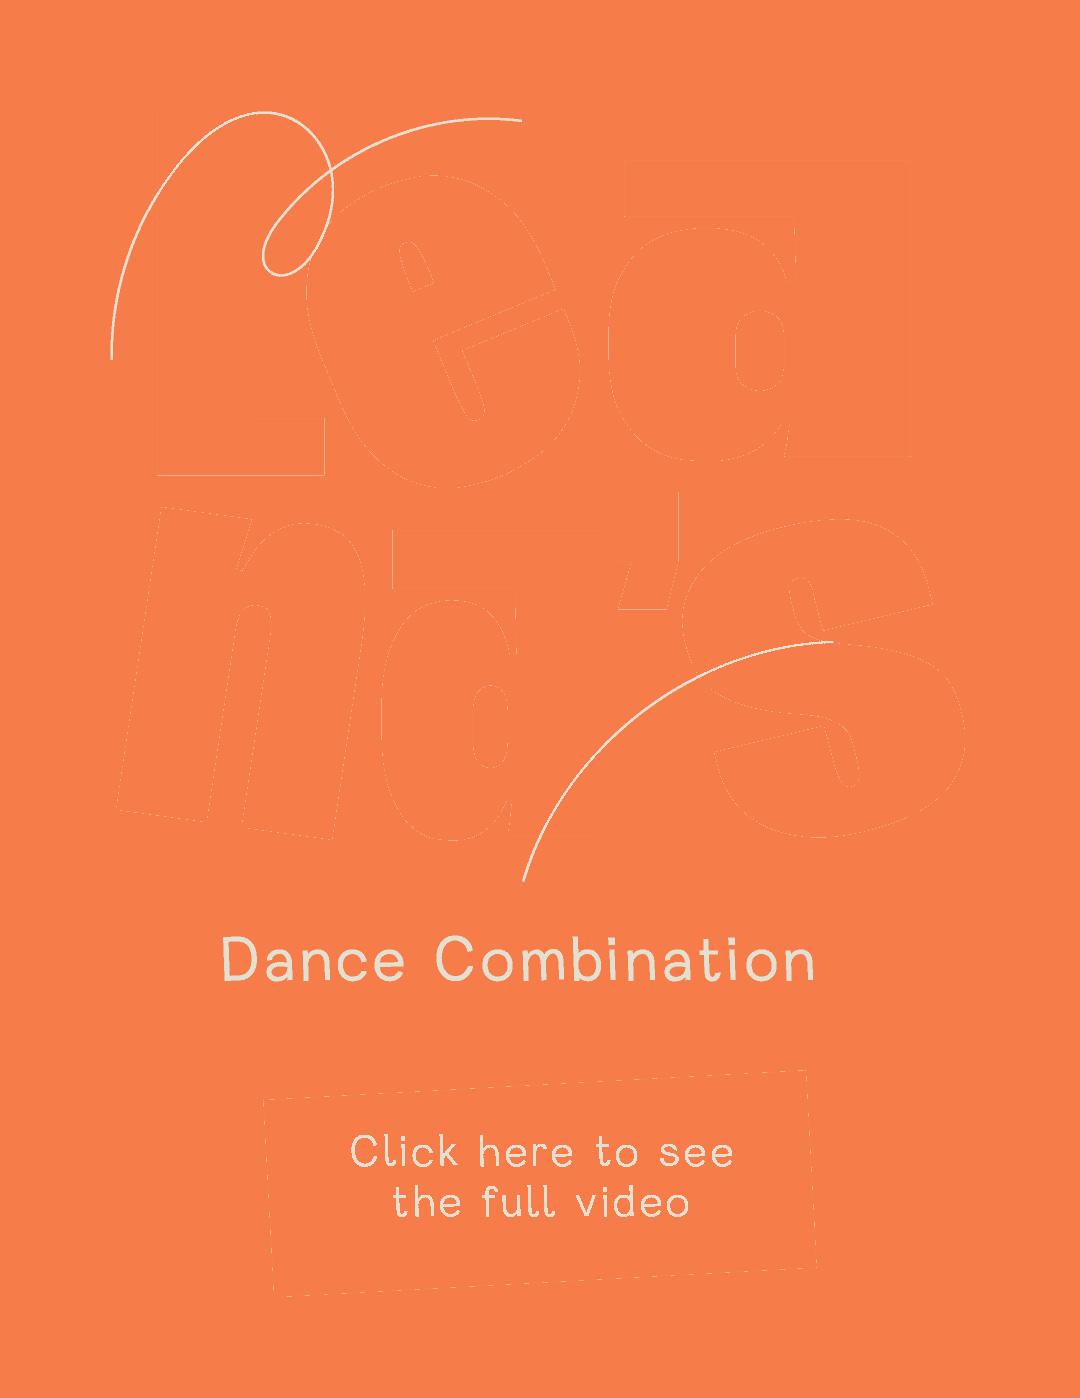 SYS-Dance-Video-Leana-Web-3